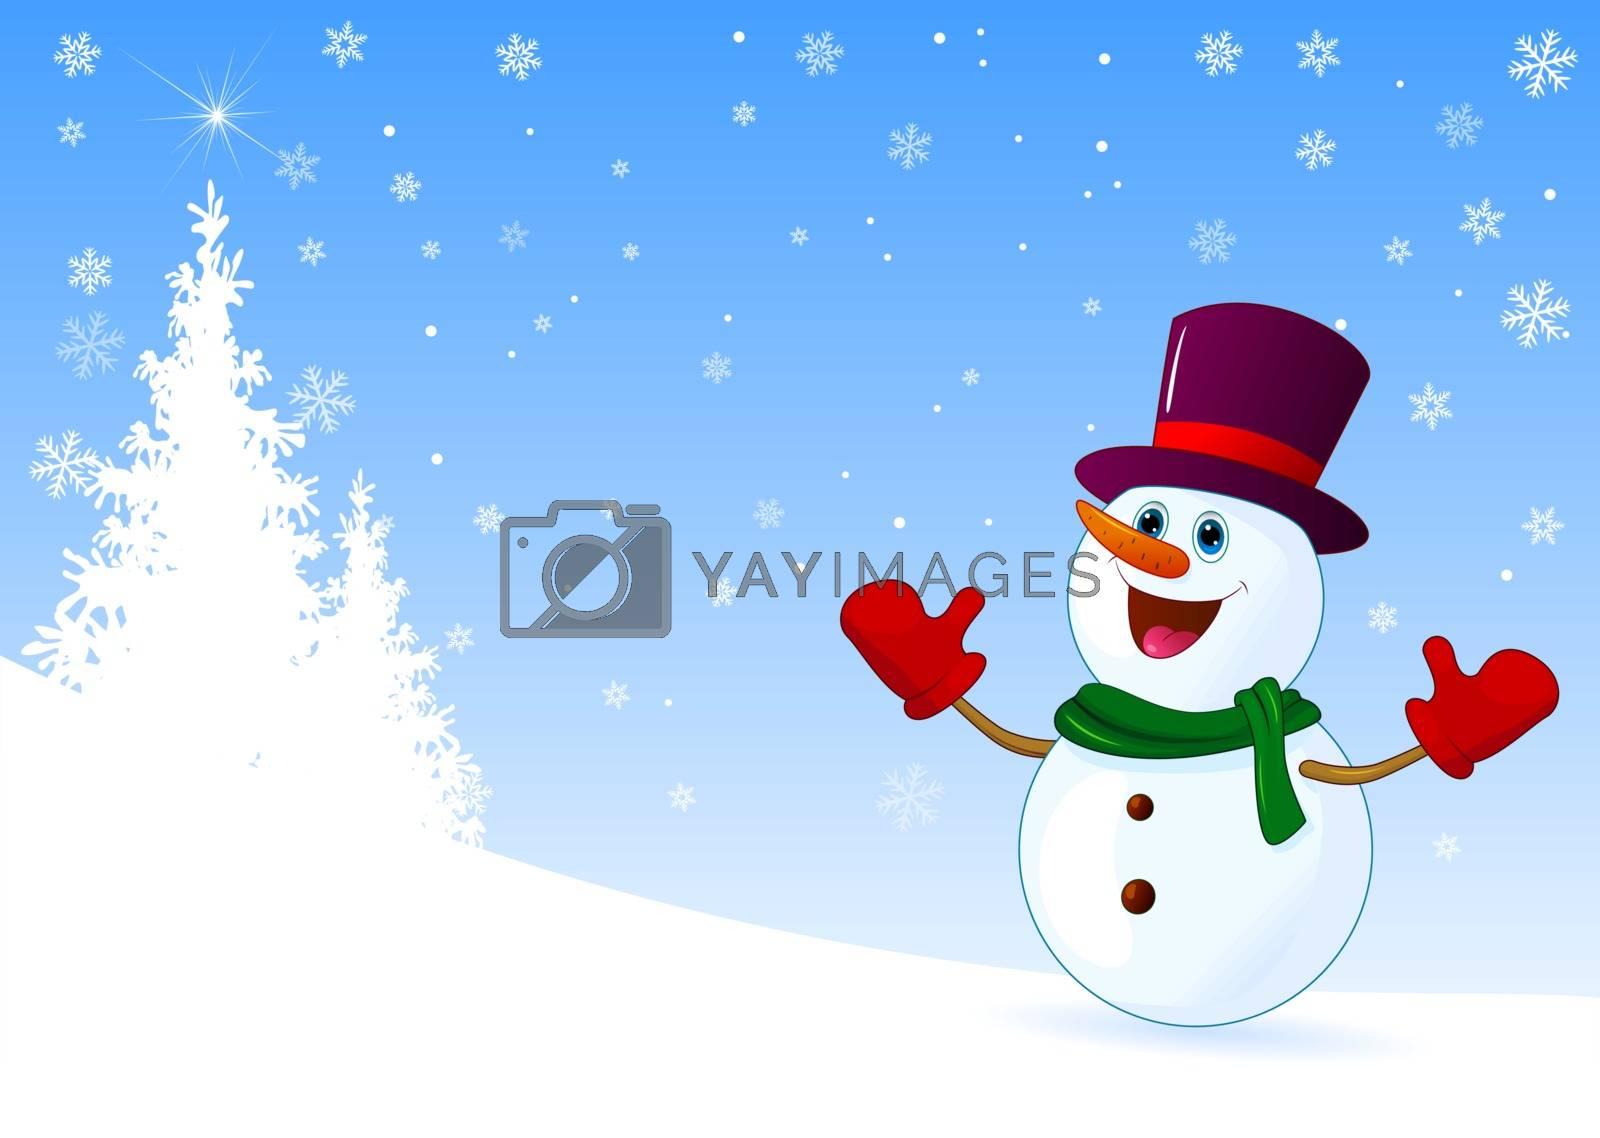 Cute joyful snowman welcomes by liolle